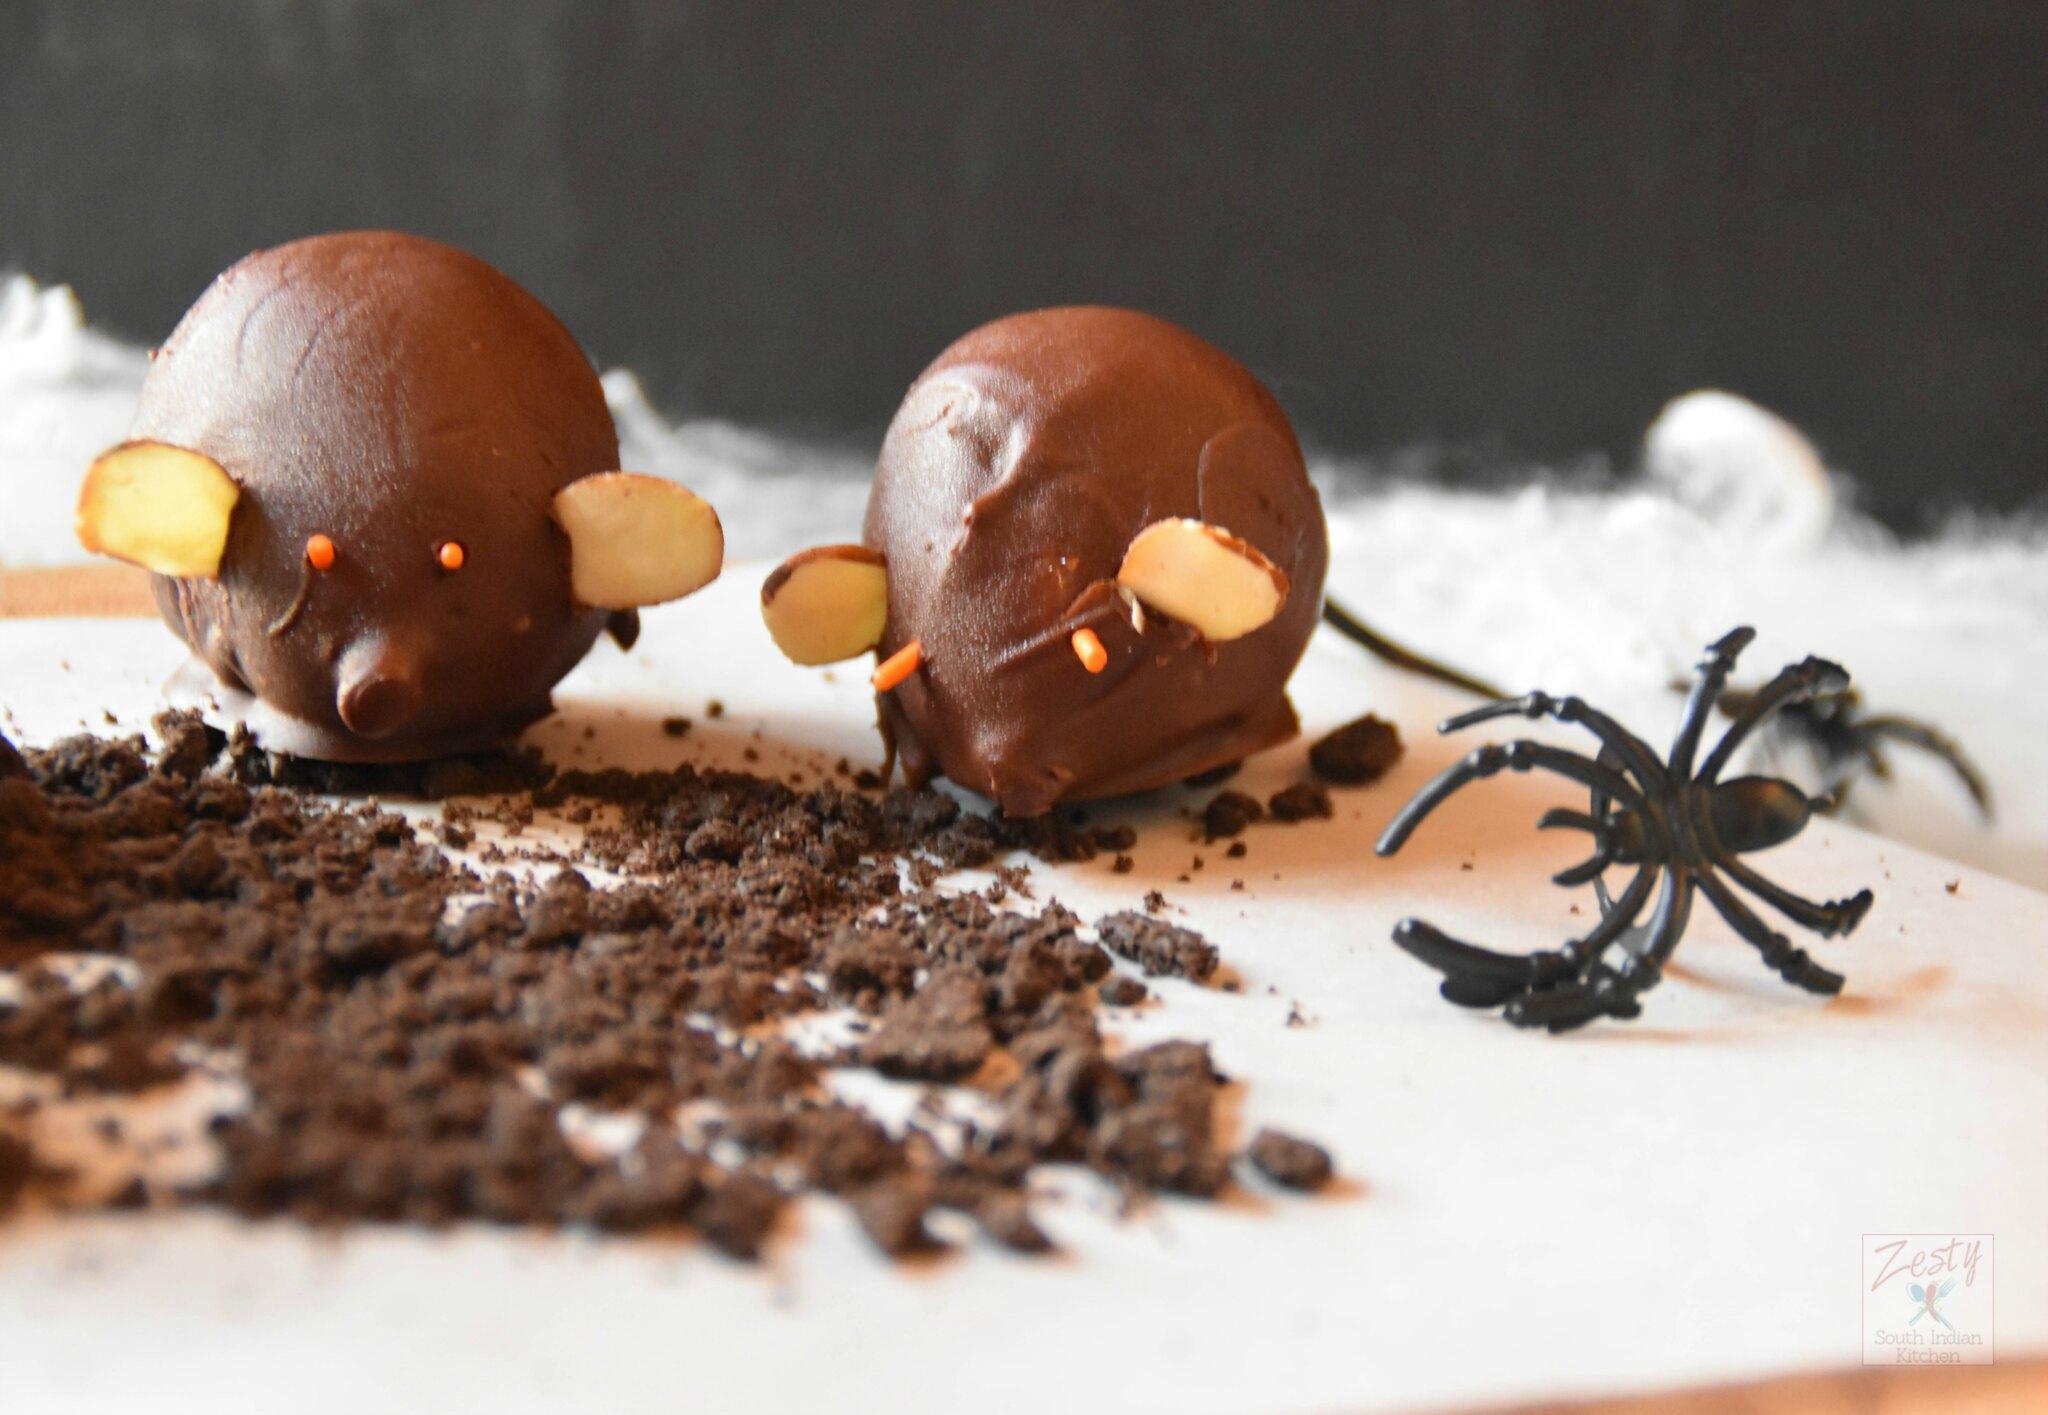 "<img src=""https://cdn.shortpixel.ai/client/q_glossy,ret_img,w_2048,h_1415/Chocolate fig mice.jpg"" alt="" Chocolate fig mice1"">"